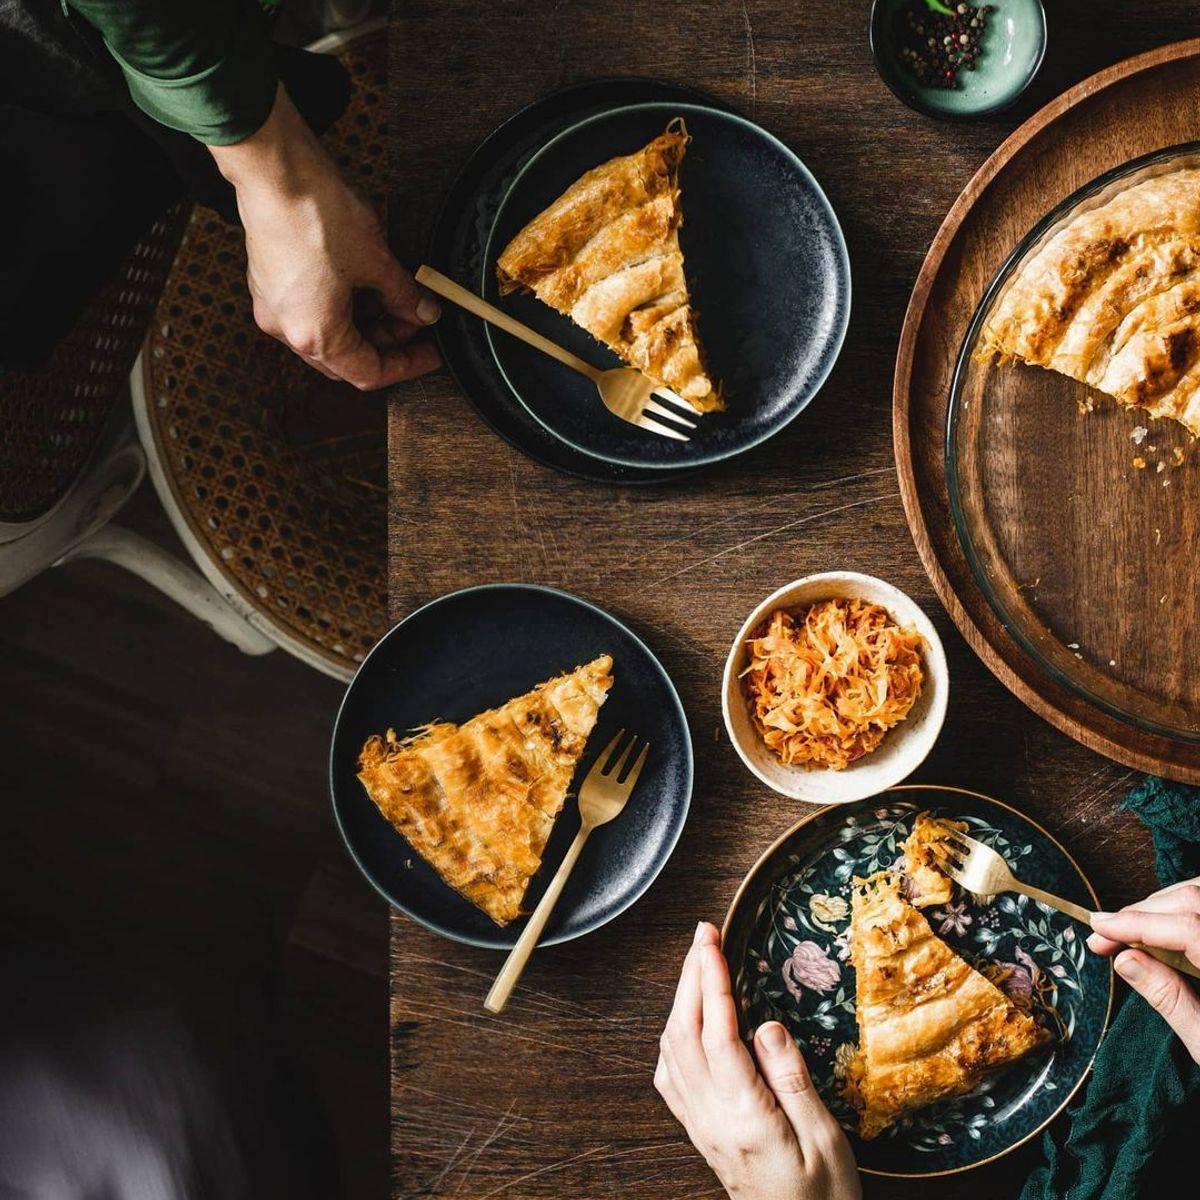 17 Pieces of Dinner Etiquette 🍽 a Lady Should Know 🤔 ...